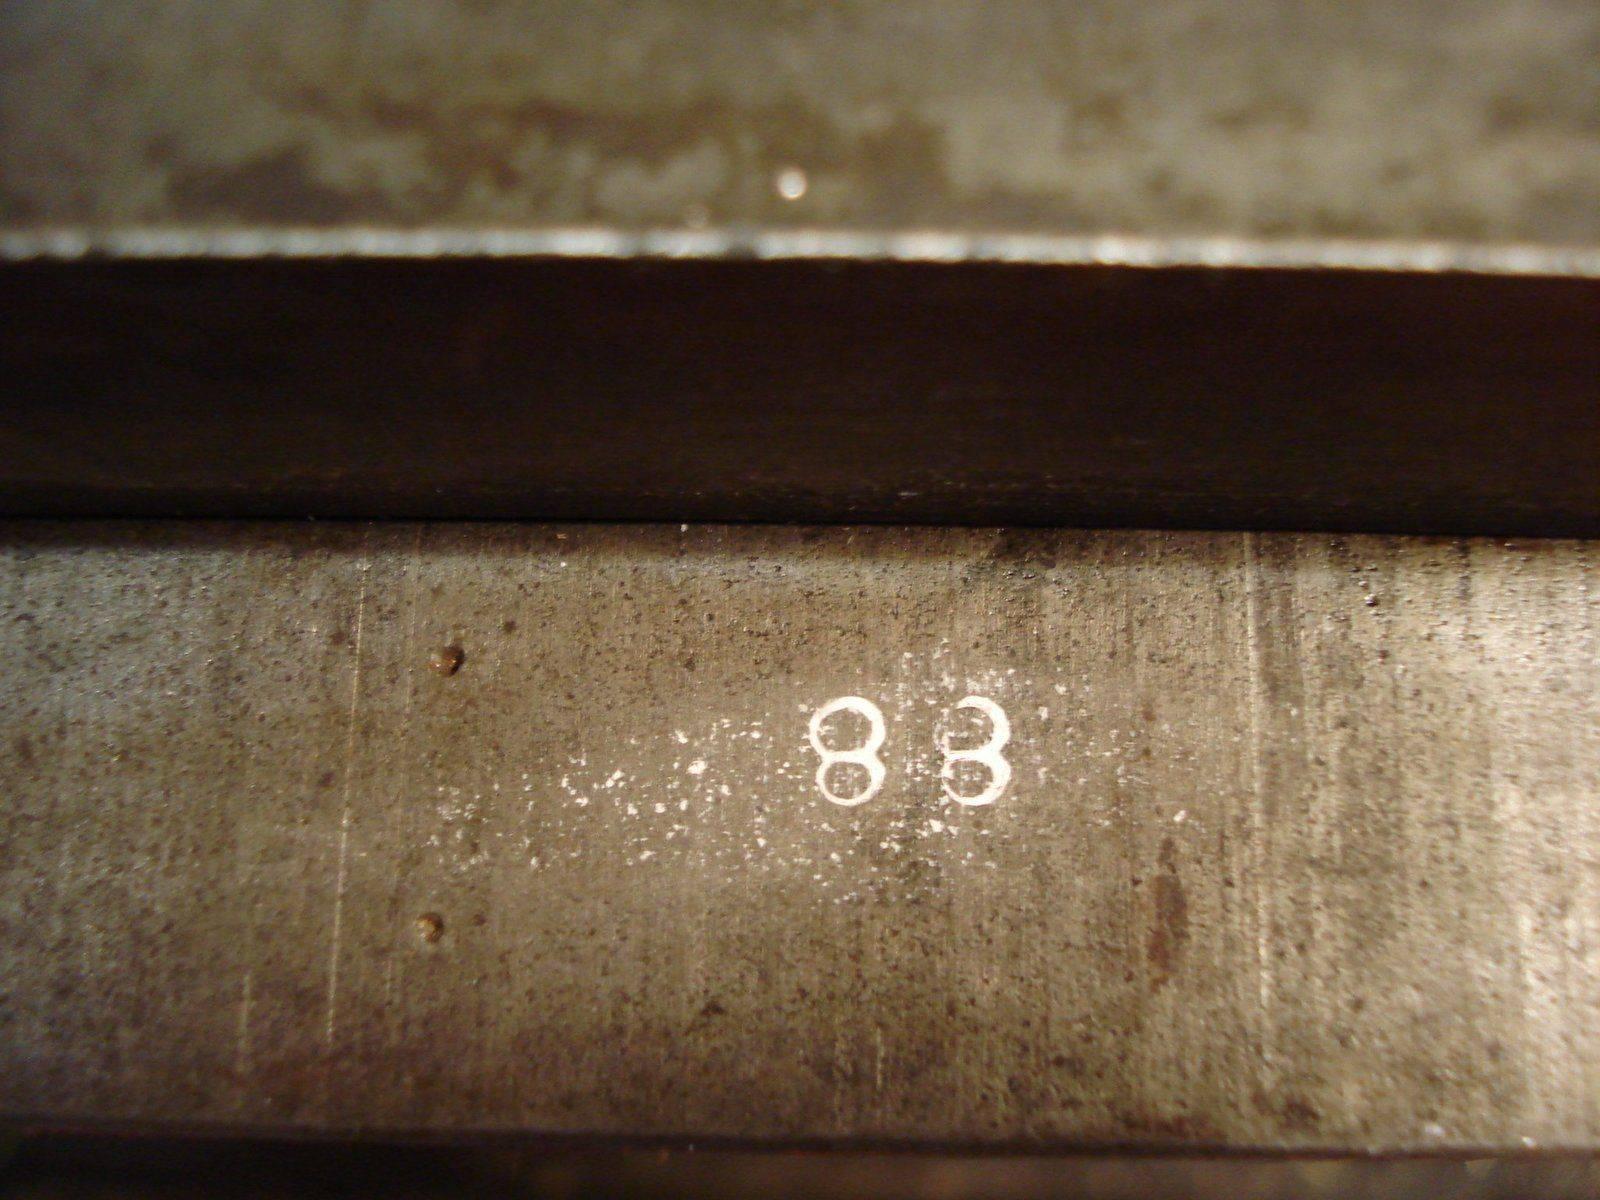 DSC06288.JPG